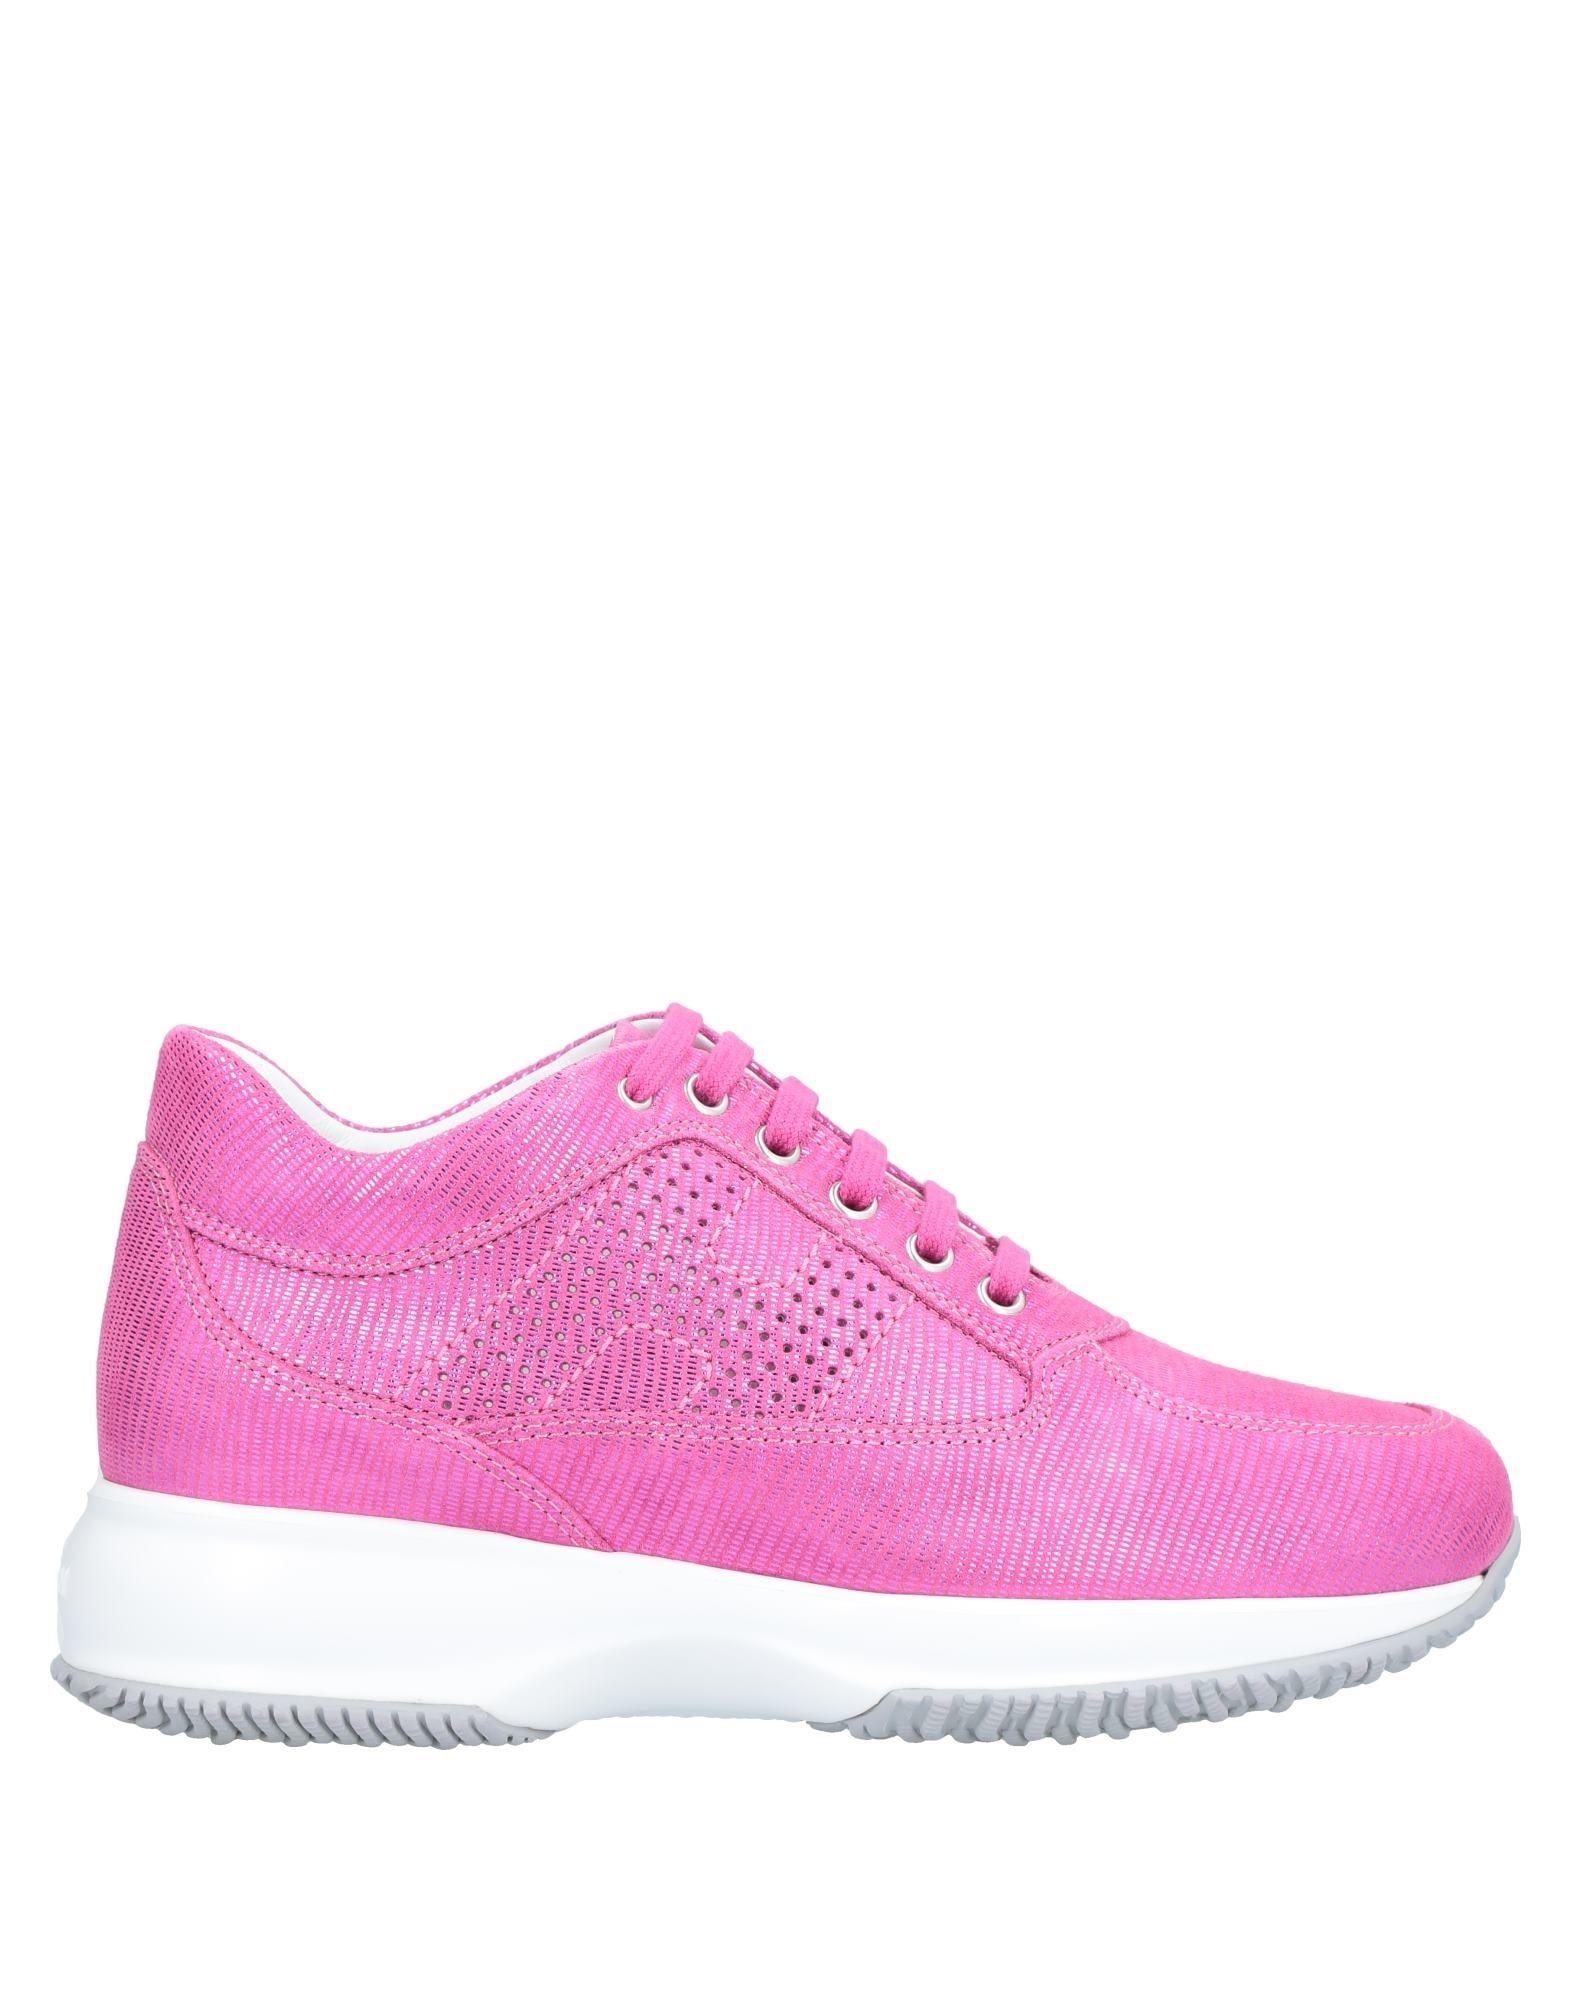 Damen Hogan Sneakers Damen   11401252KP Heiße Schuhe 7da735